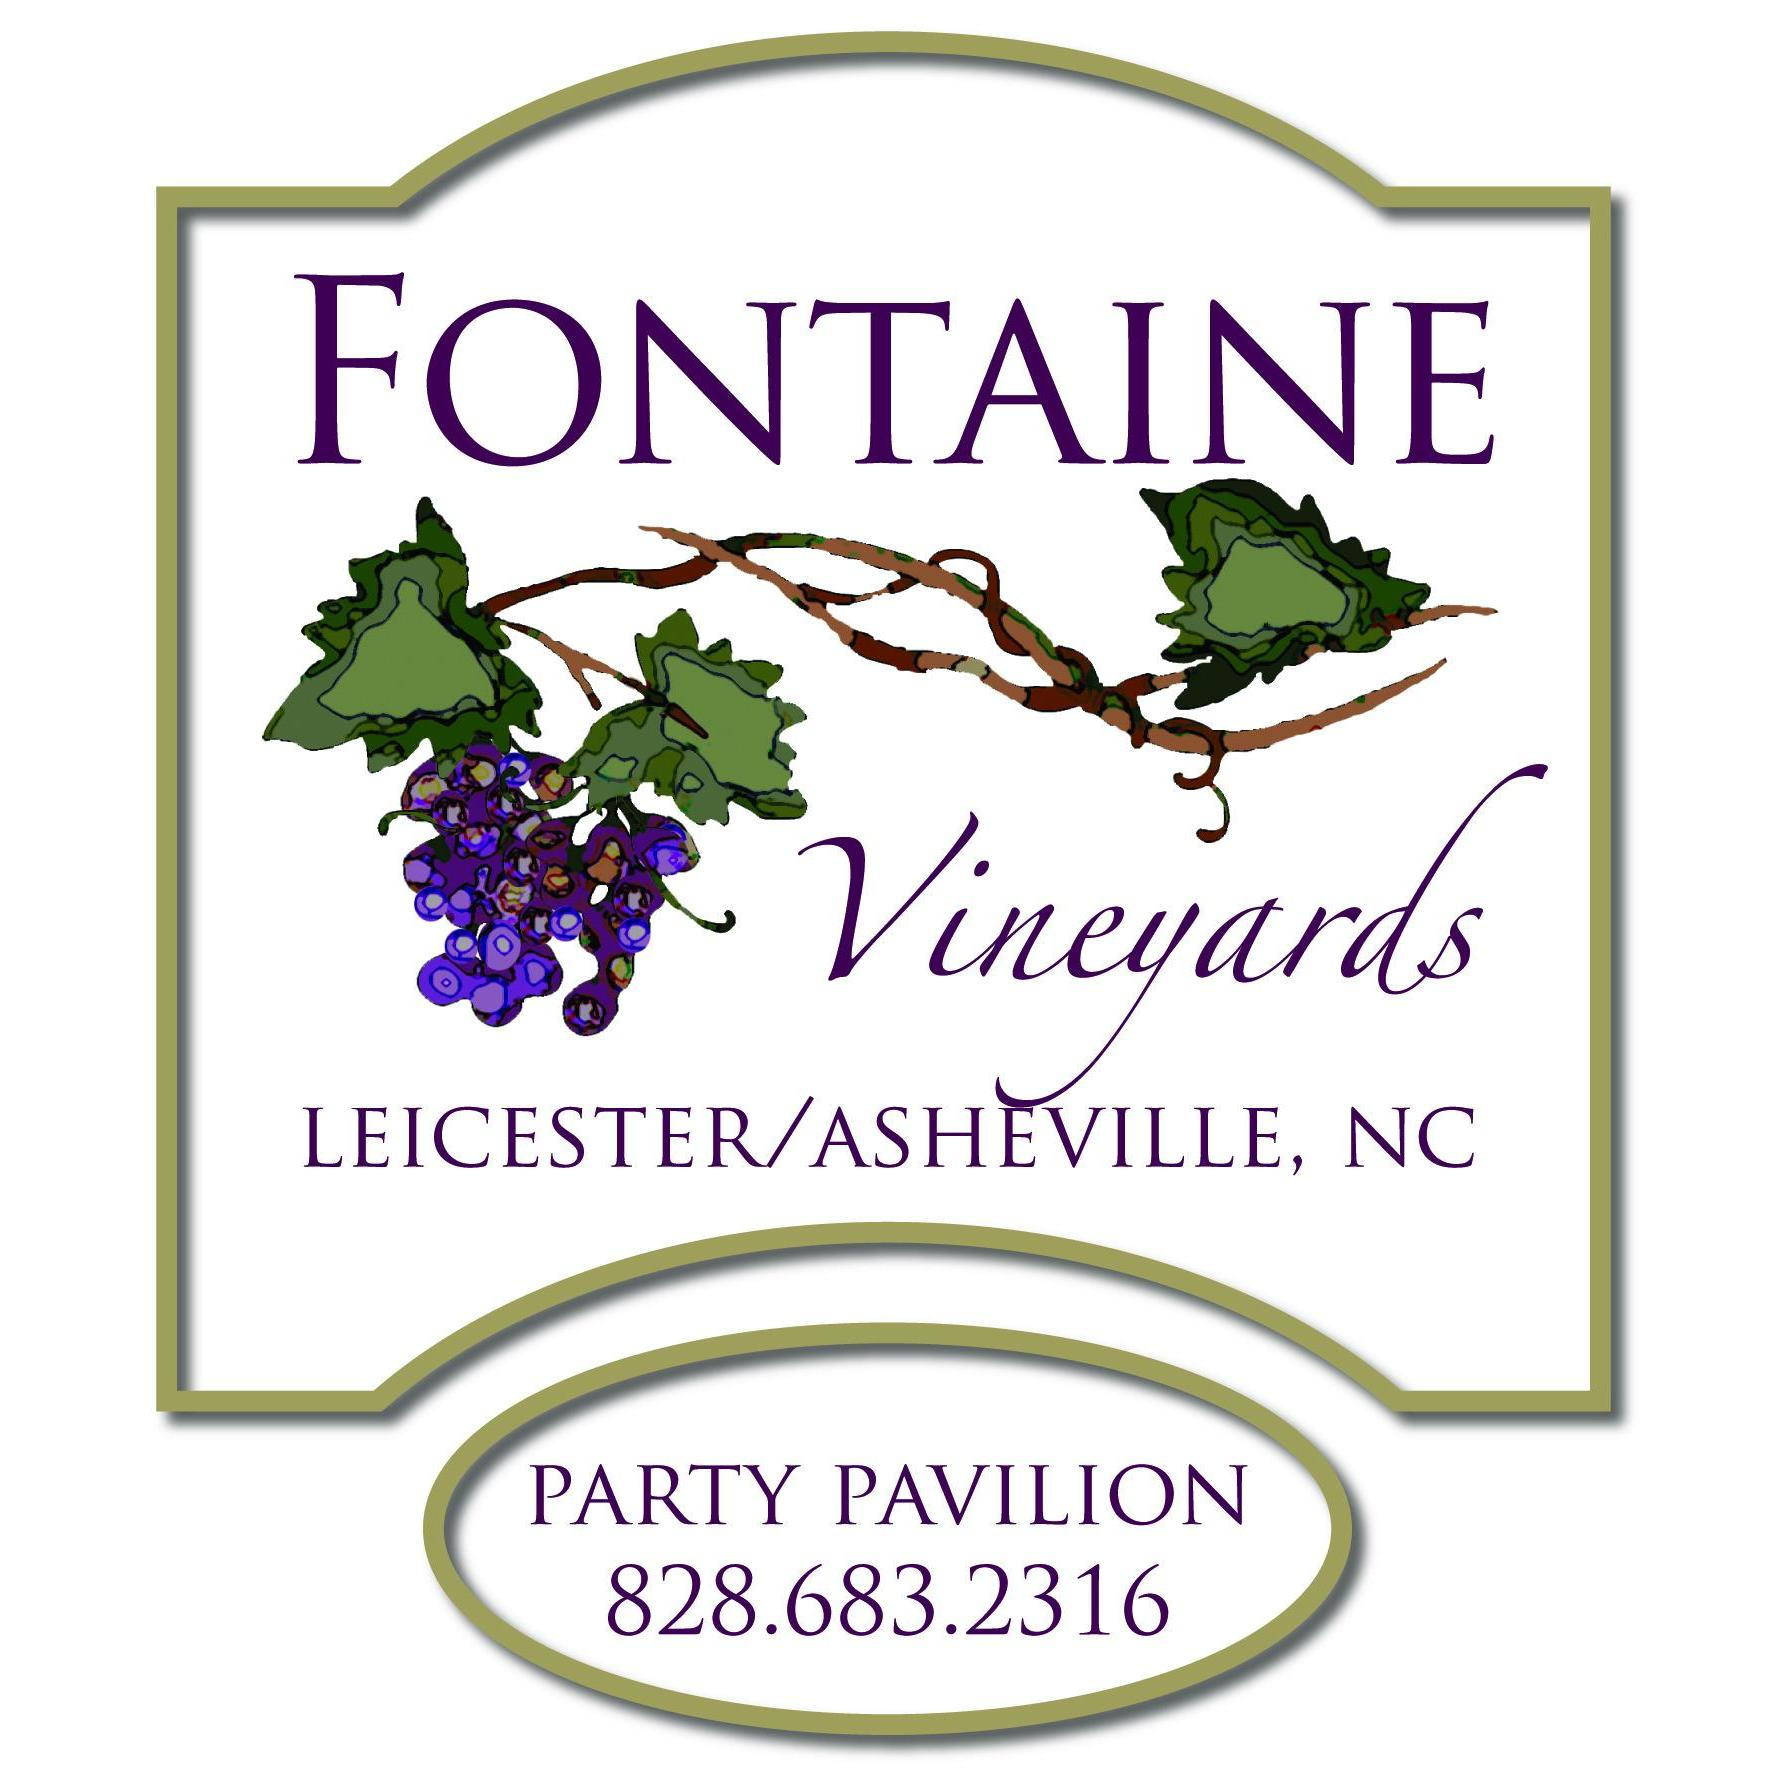 Fontaine Vineyards